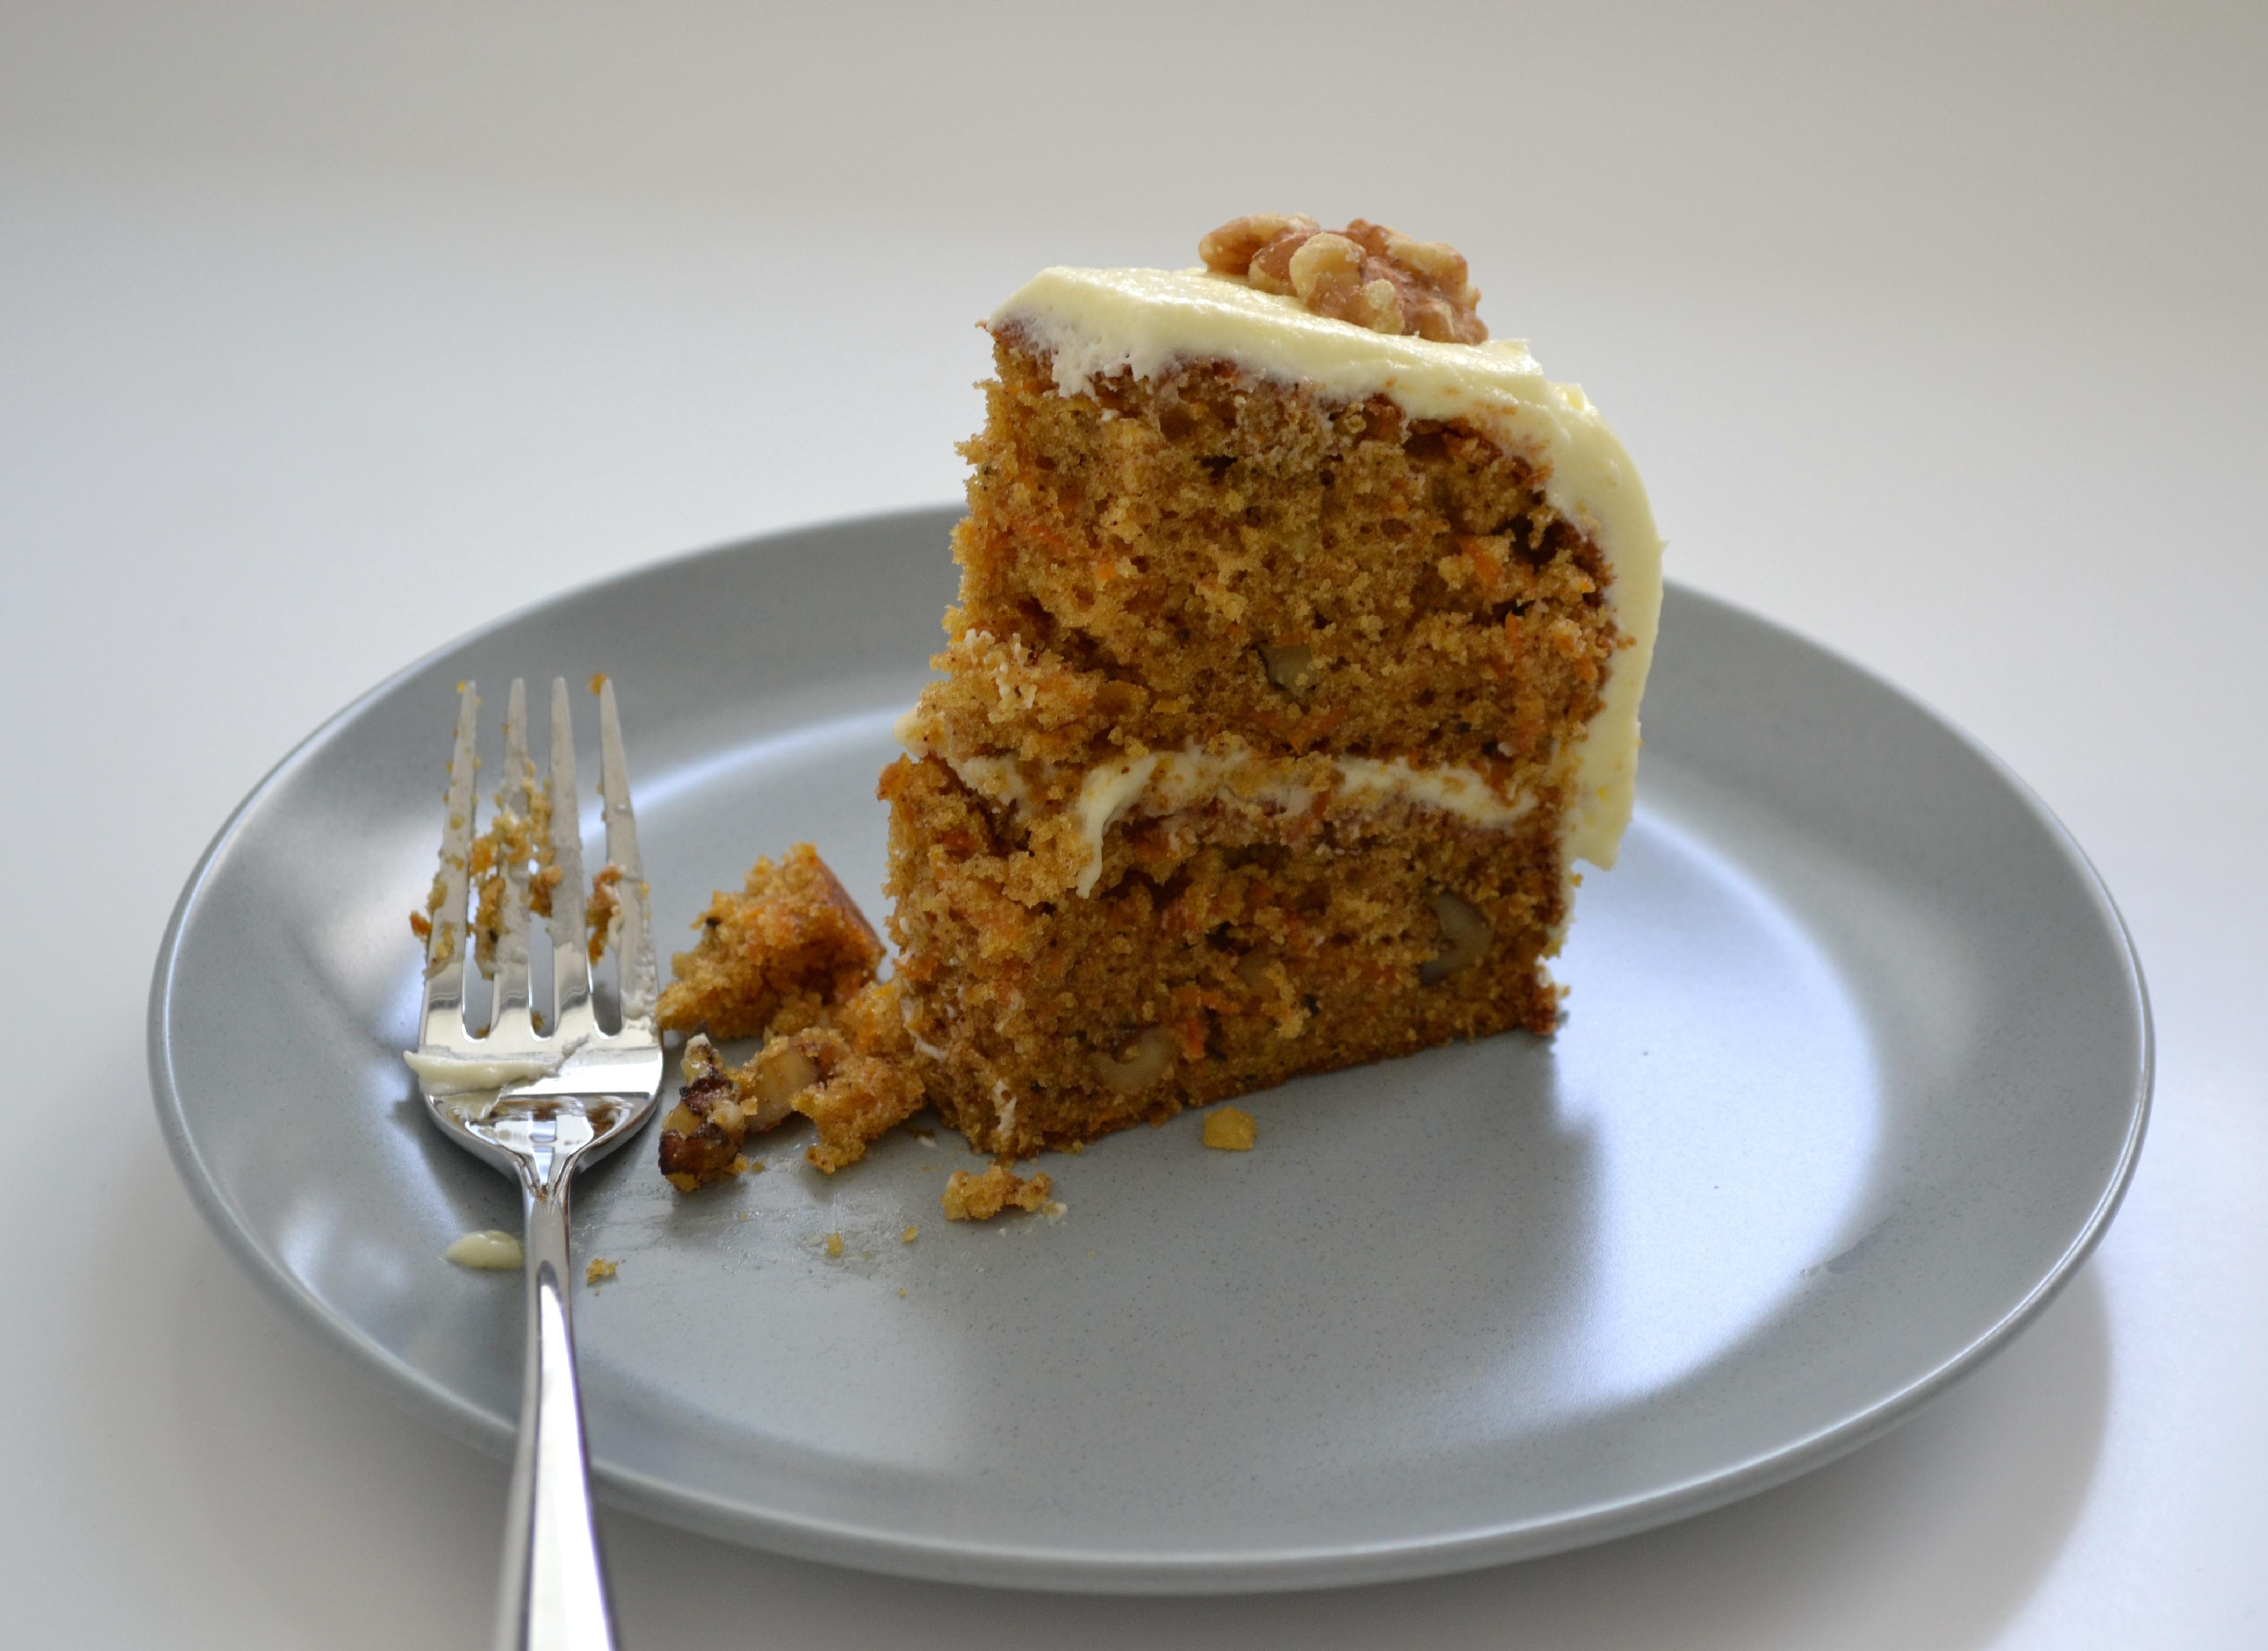 Hummingbird Bakery S Carrot Cake The Perky Pancake